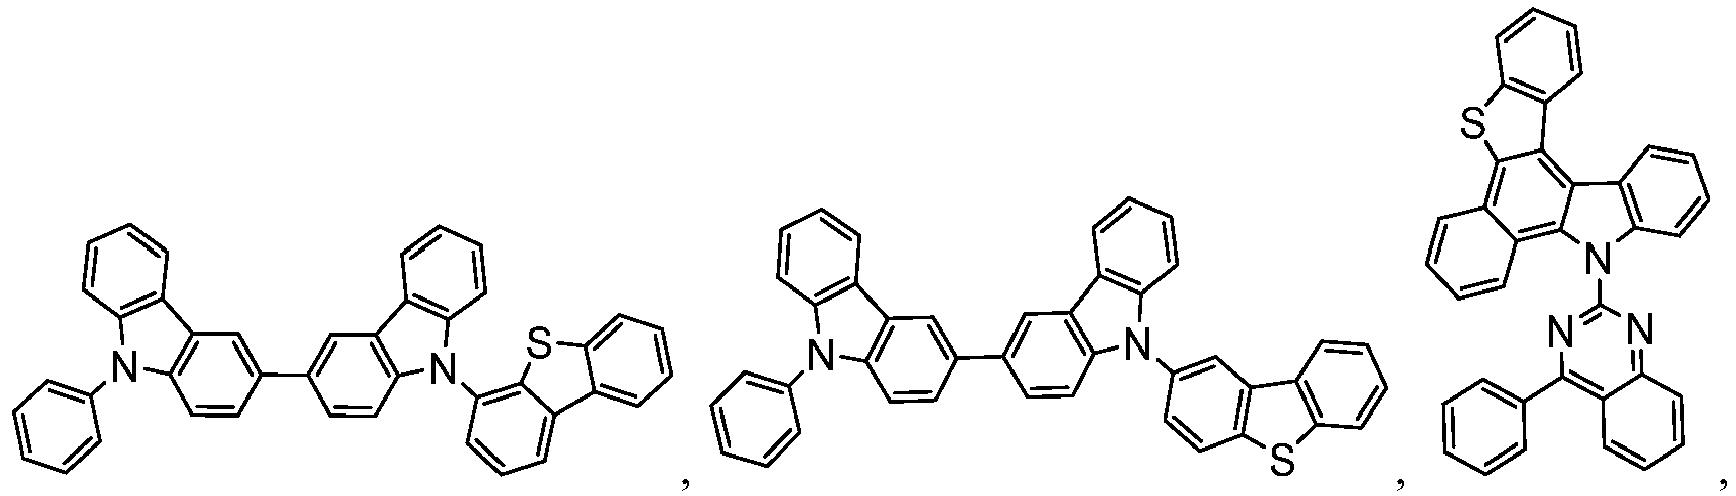 Figure imgb0432